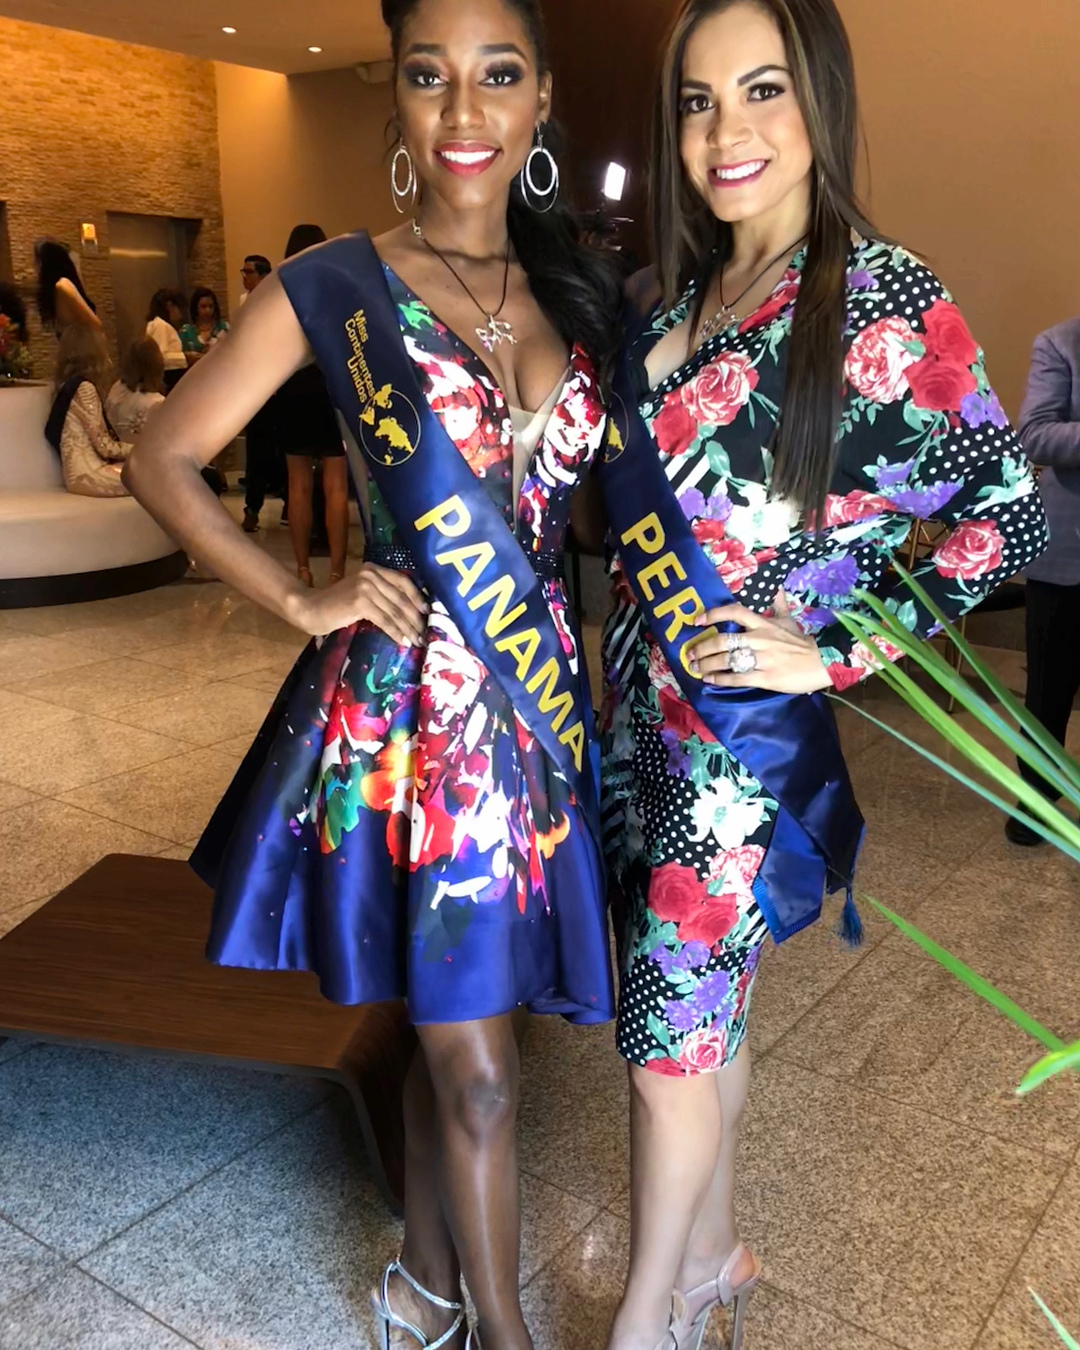 patricia seminario, miss peru continentes unidos 2018/miss asia pacific peru 2017. - Página 3 40887110